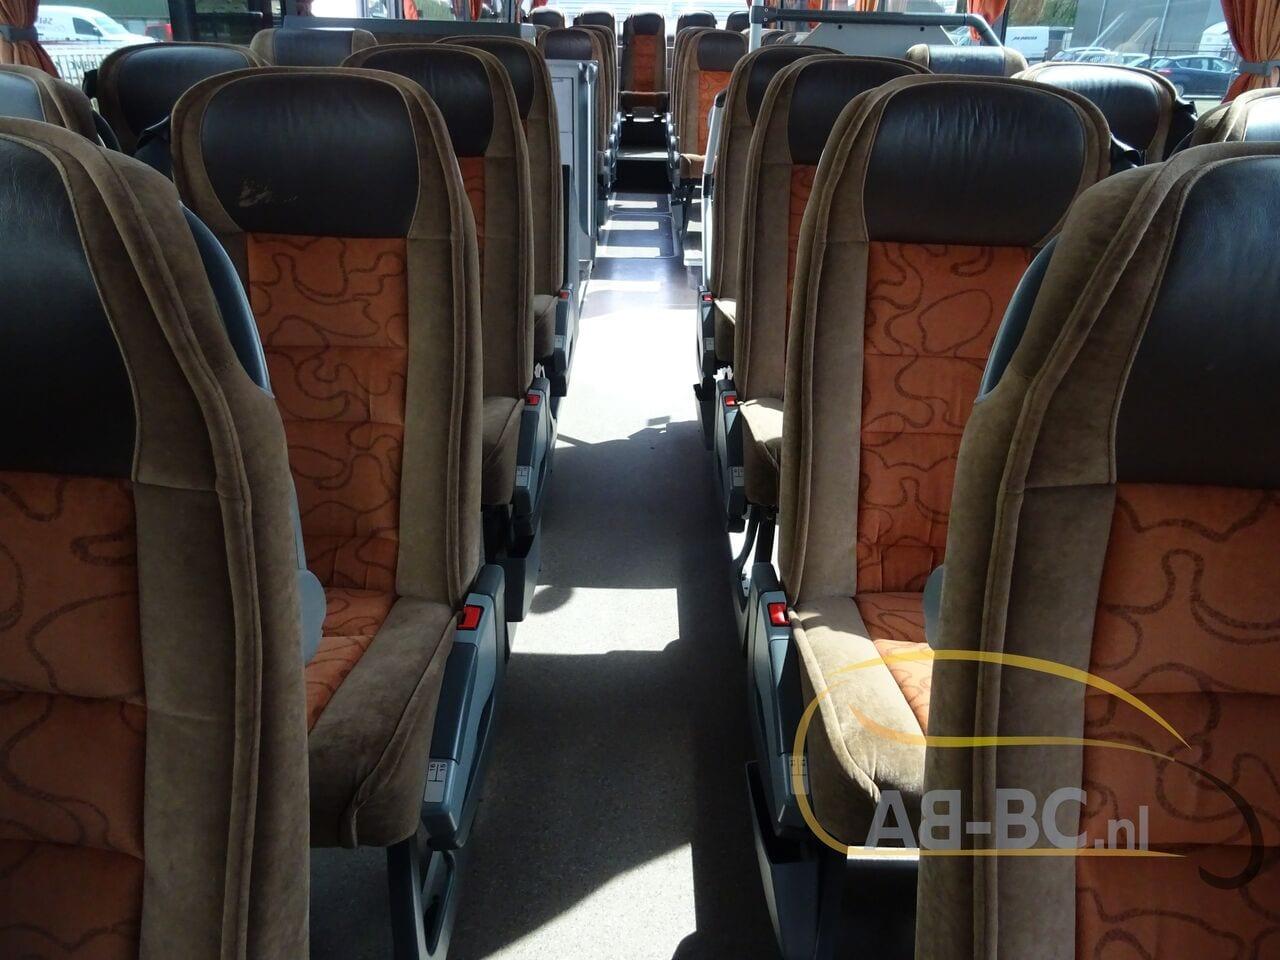 coach-busSETRA-S416H-48-SEATS-LIFTBUS---1620309883745565376_big_f4e382b3661bbd86b419ecb8c6f0effa--21050616581387095000